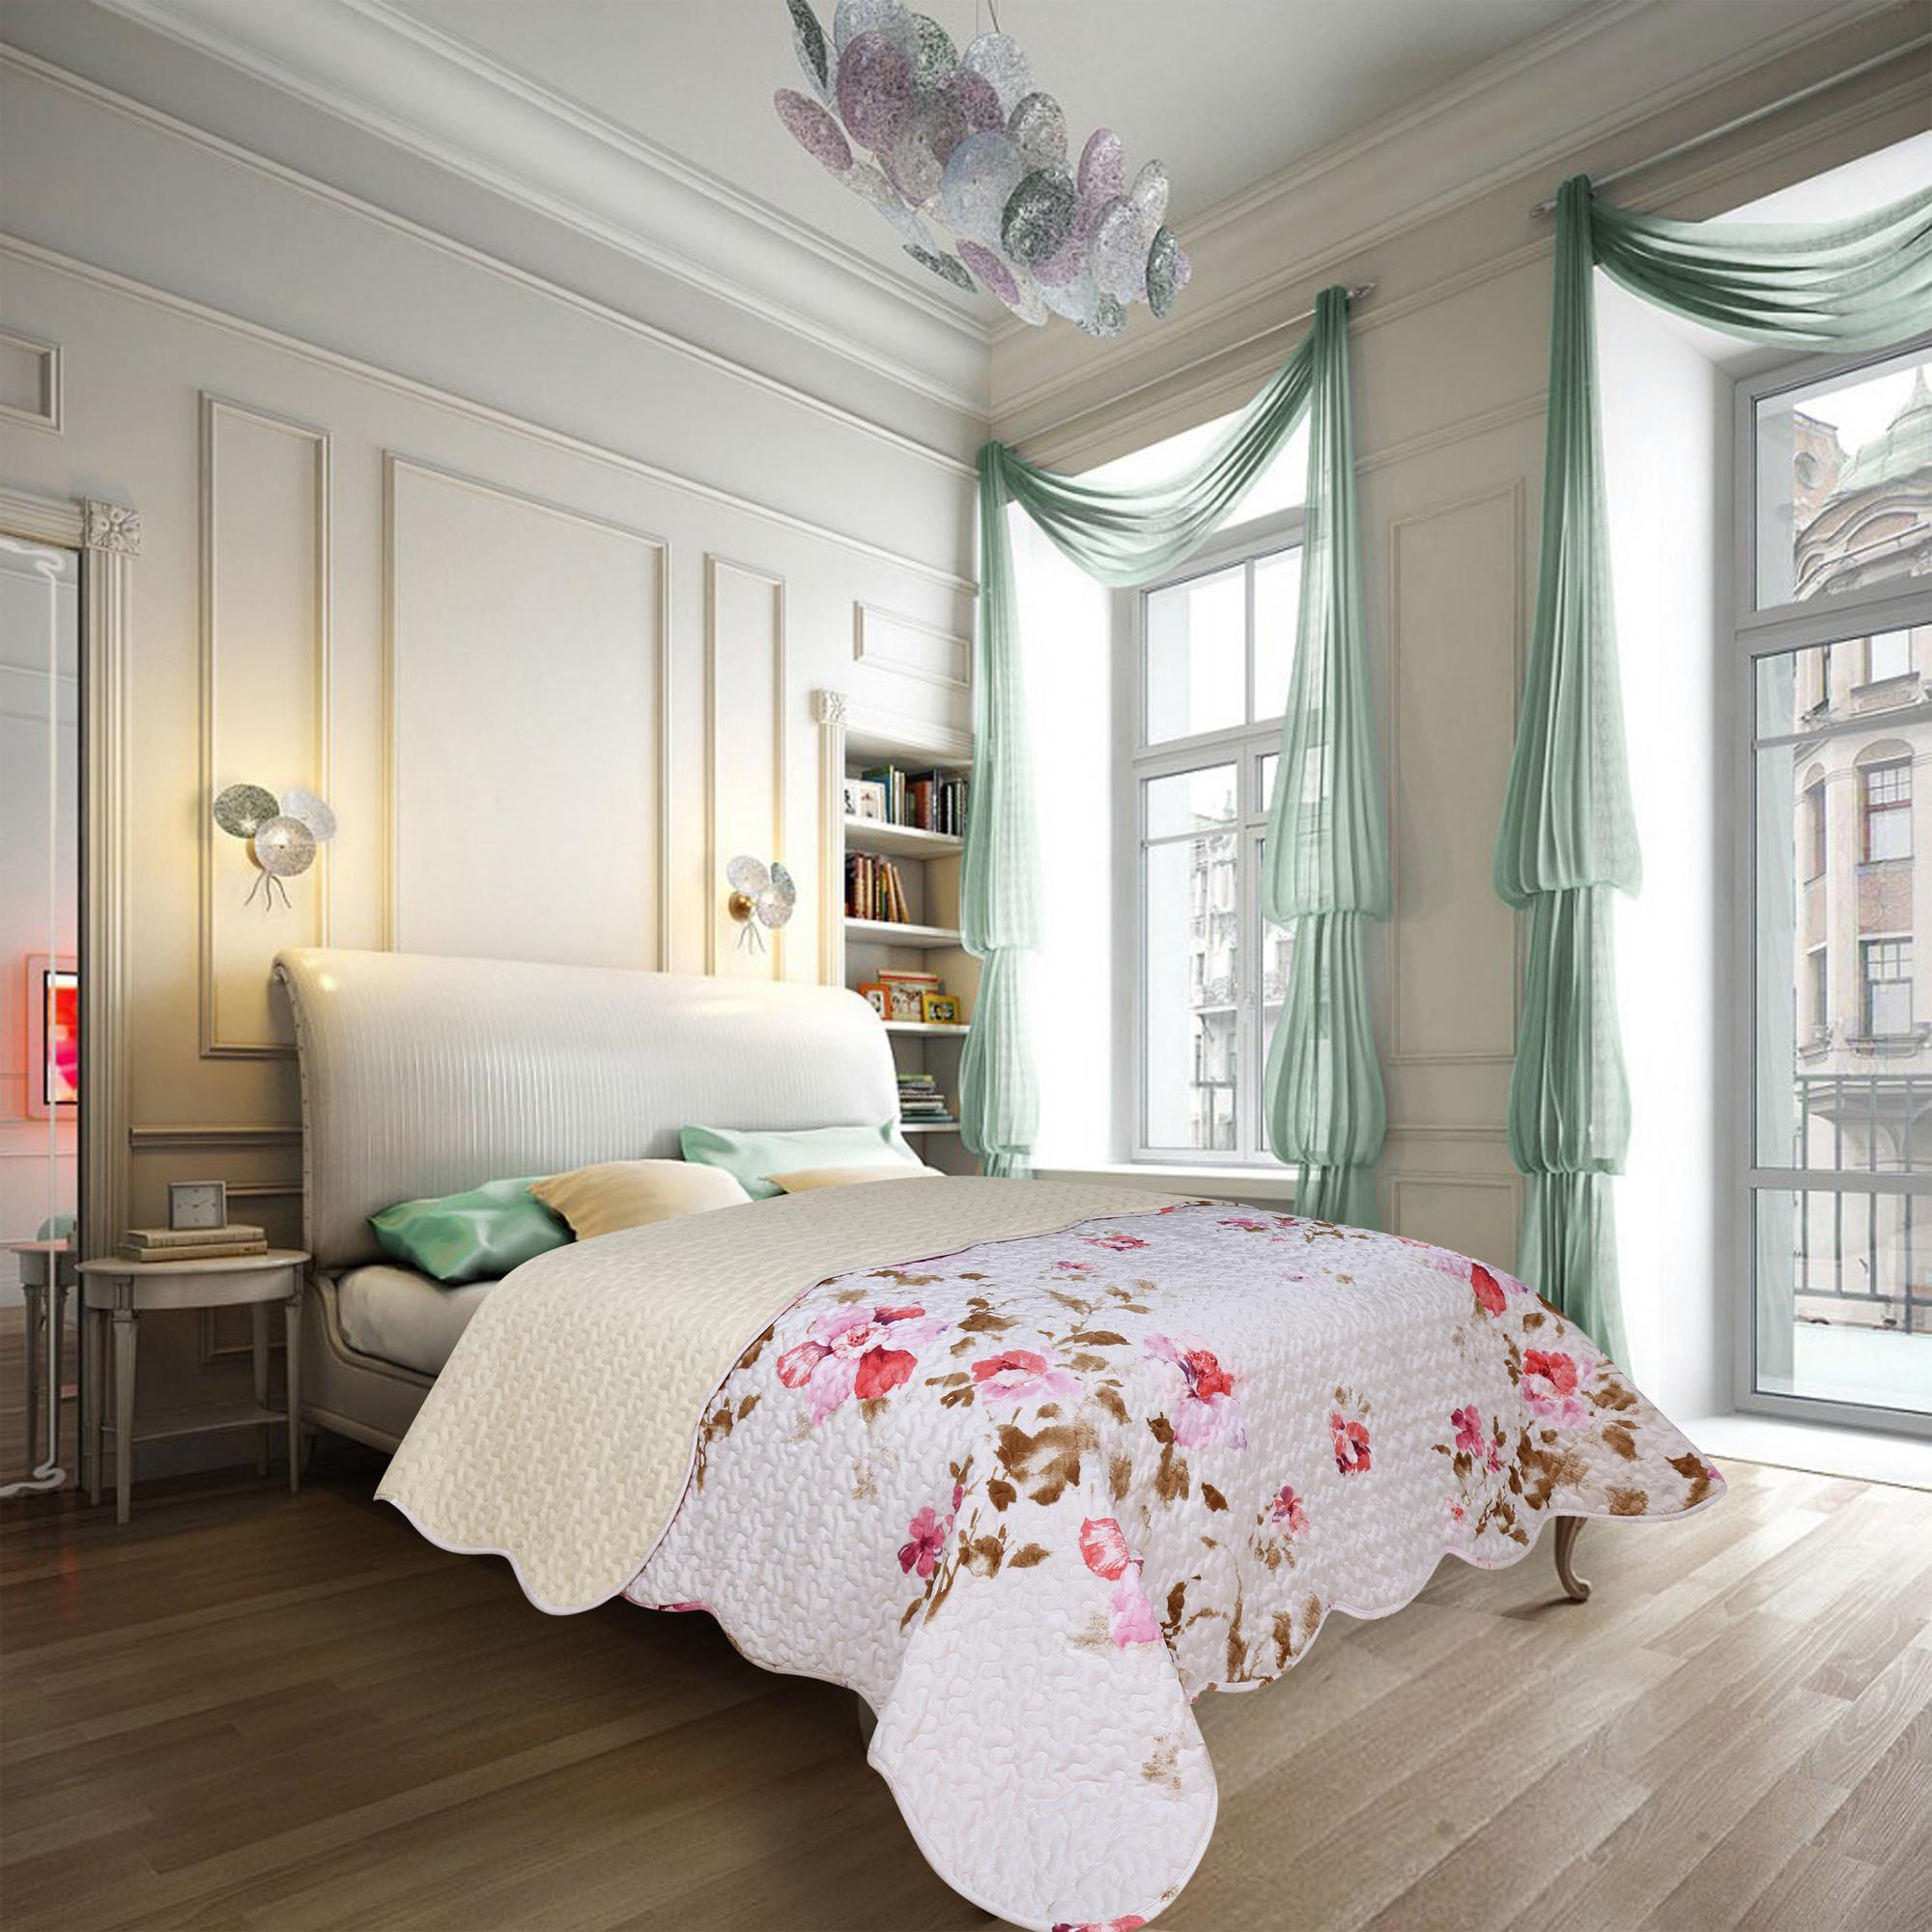 Покрывало Amore Mio Покрывало Nice (220х240 см)